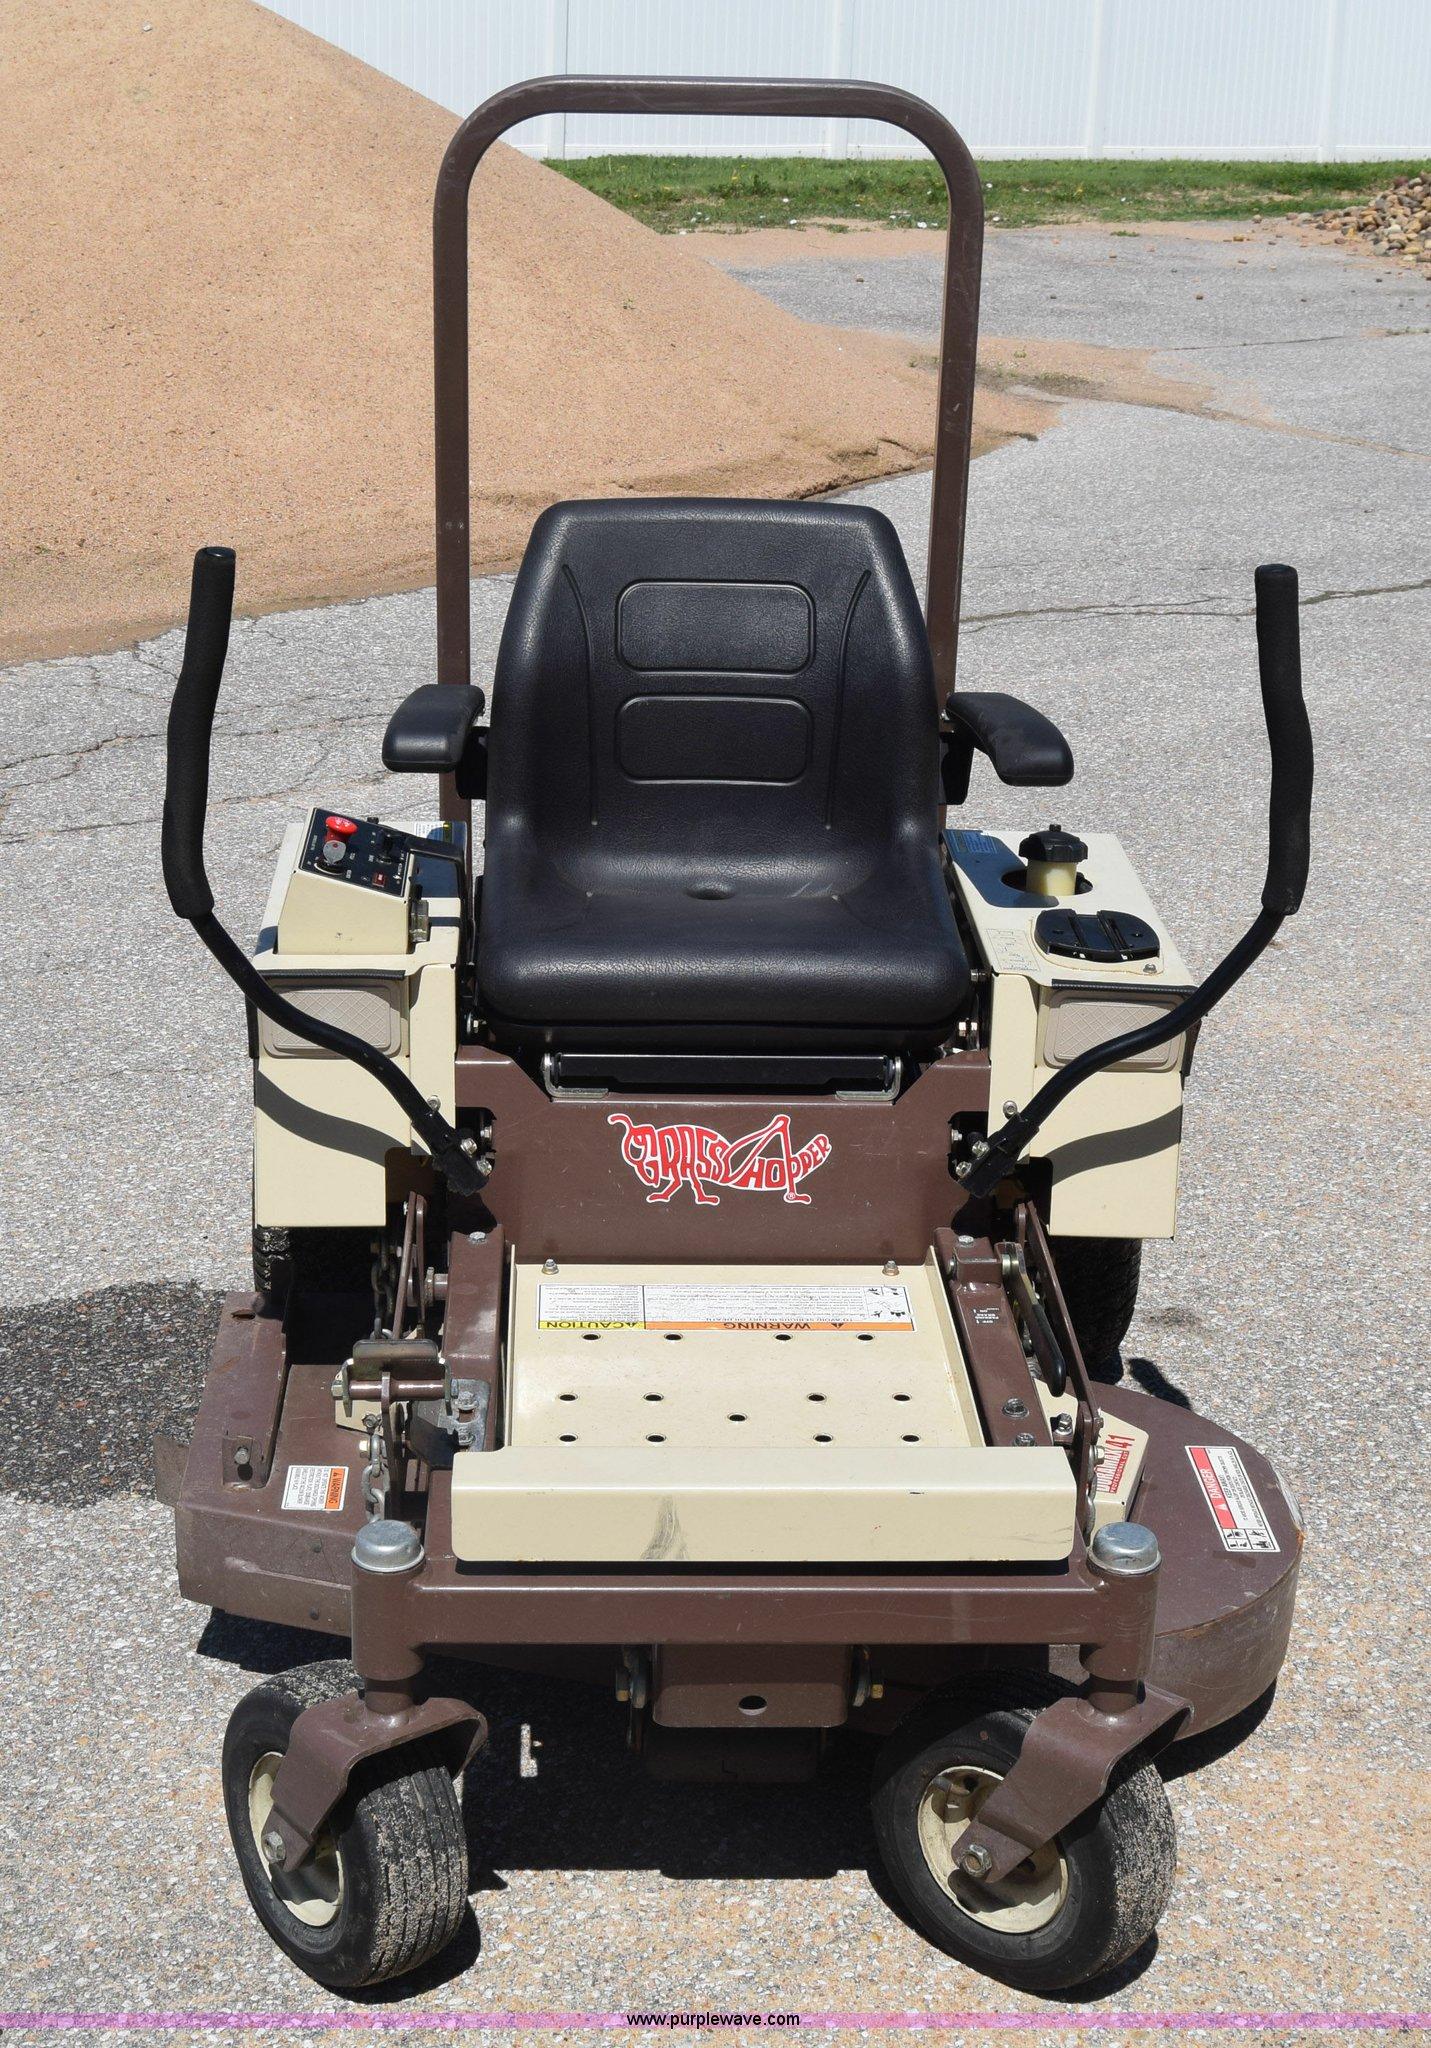 Grasshopper 120 ZTR lawn mower   Item K6630   SOLD! June 15